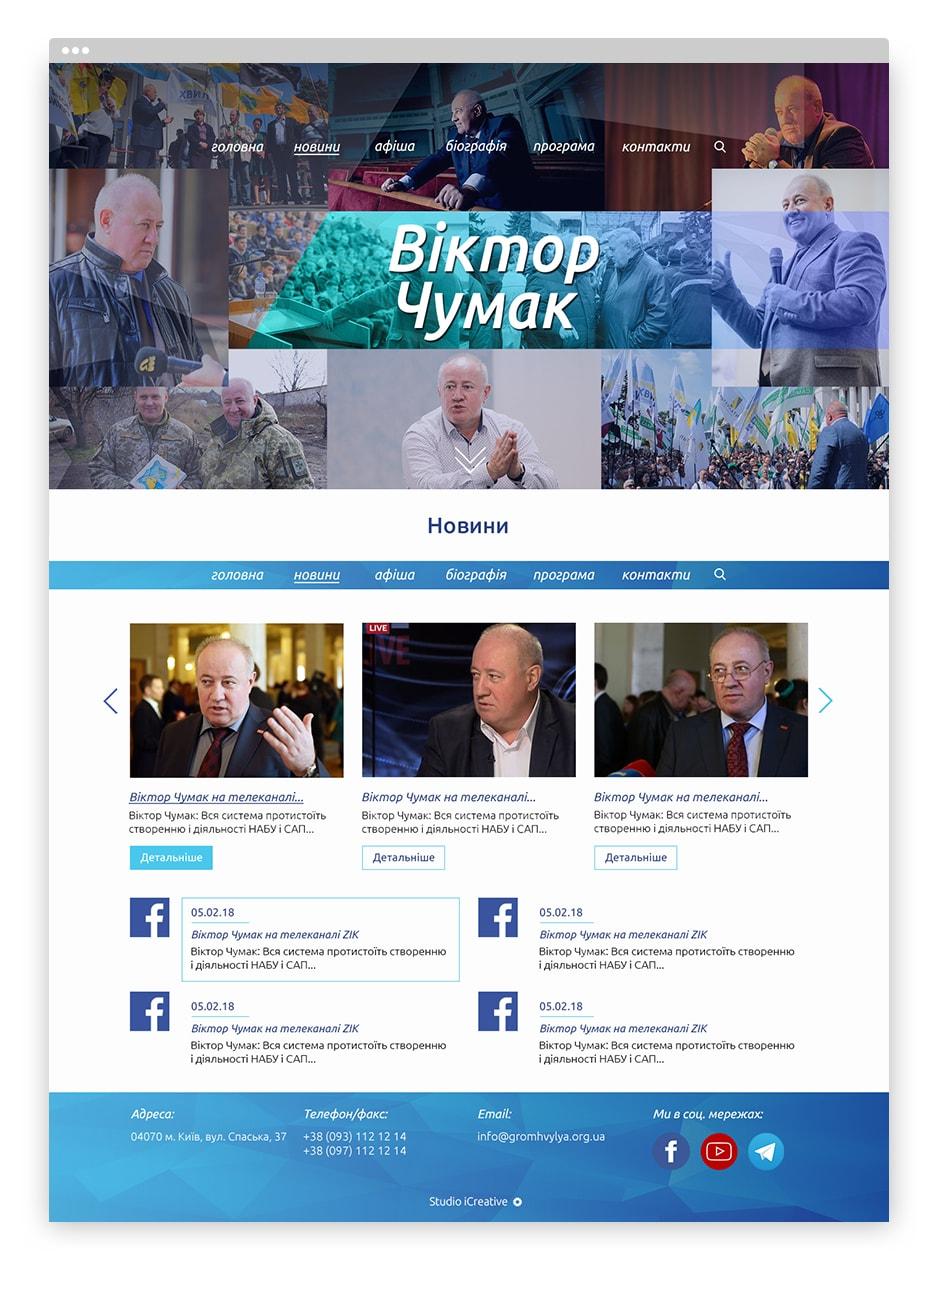 icreative.com.ua_victor_chumak_1